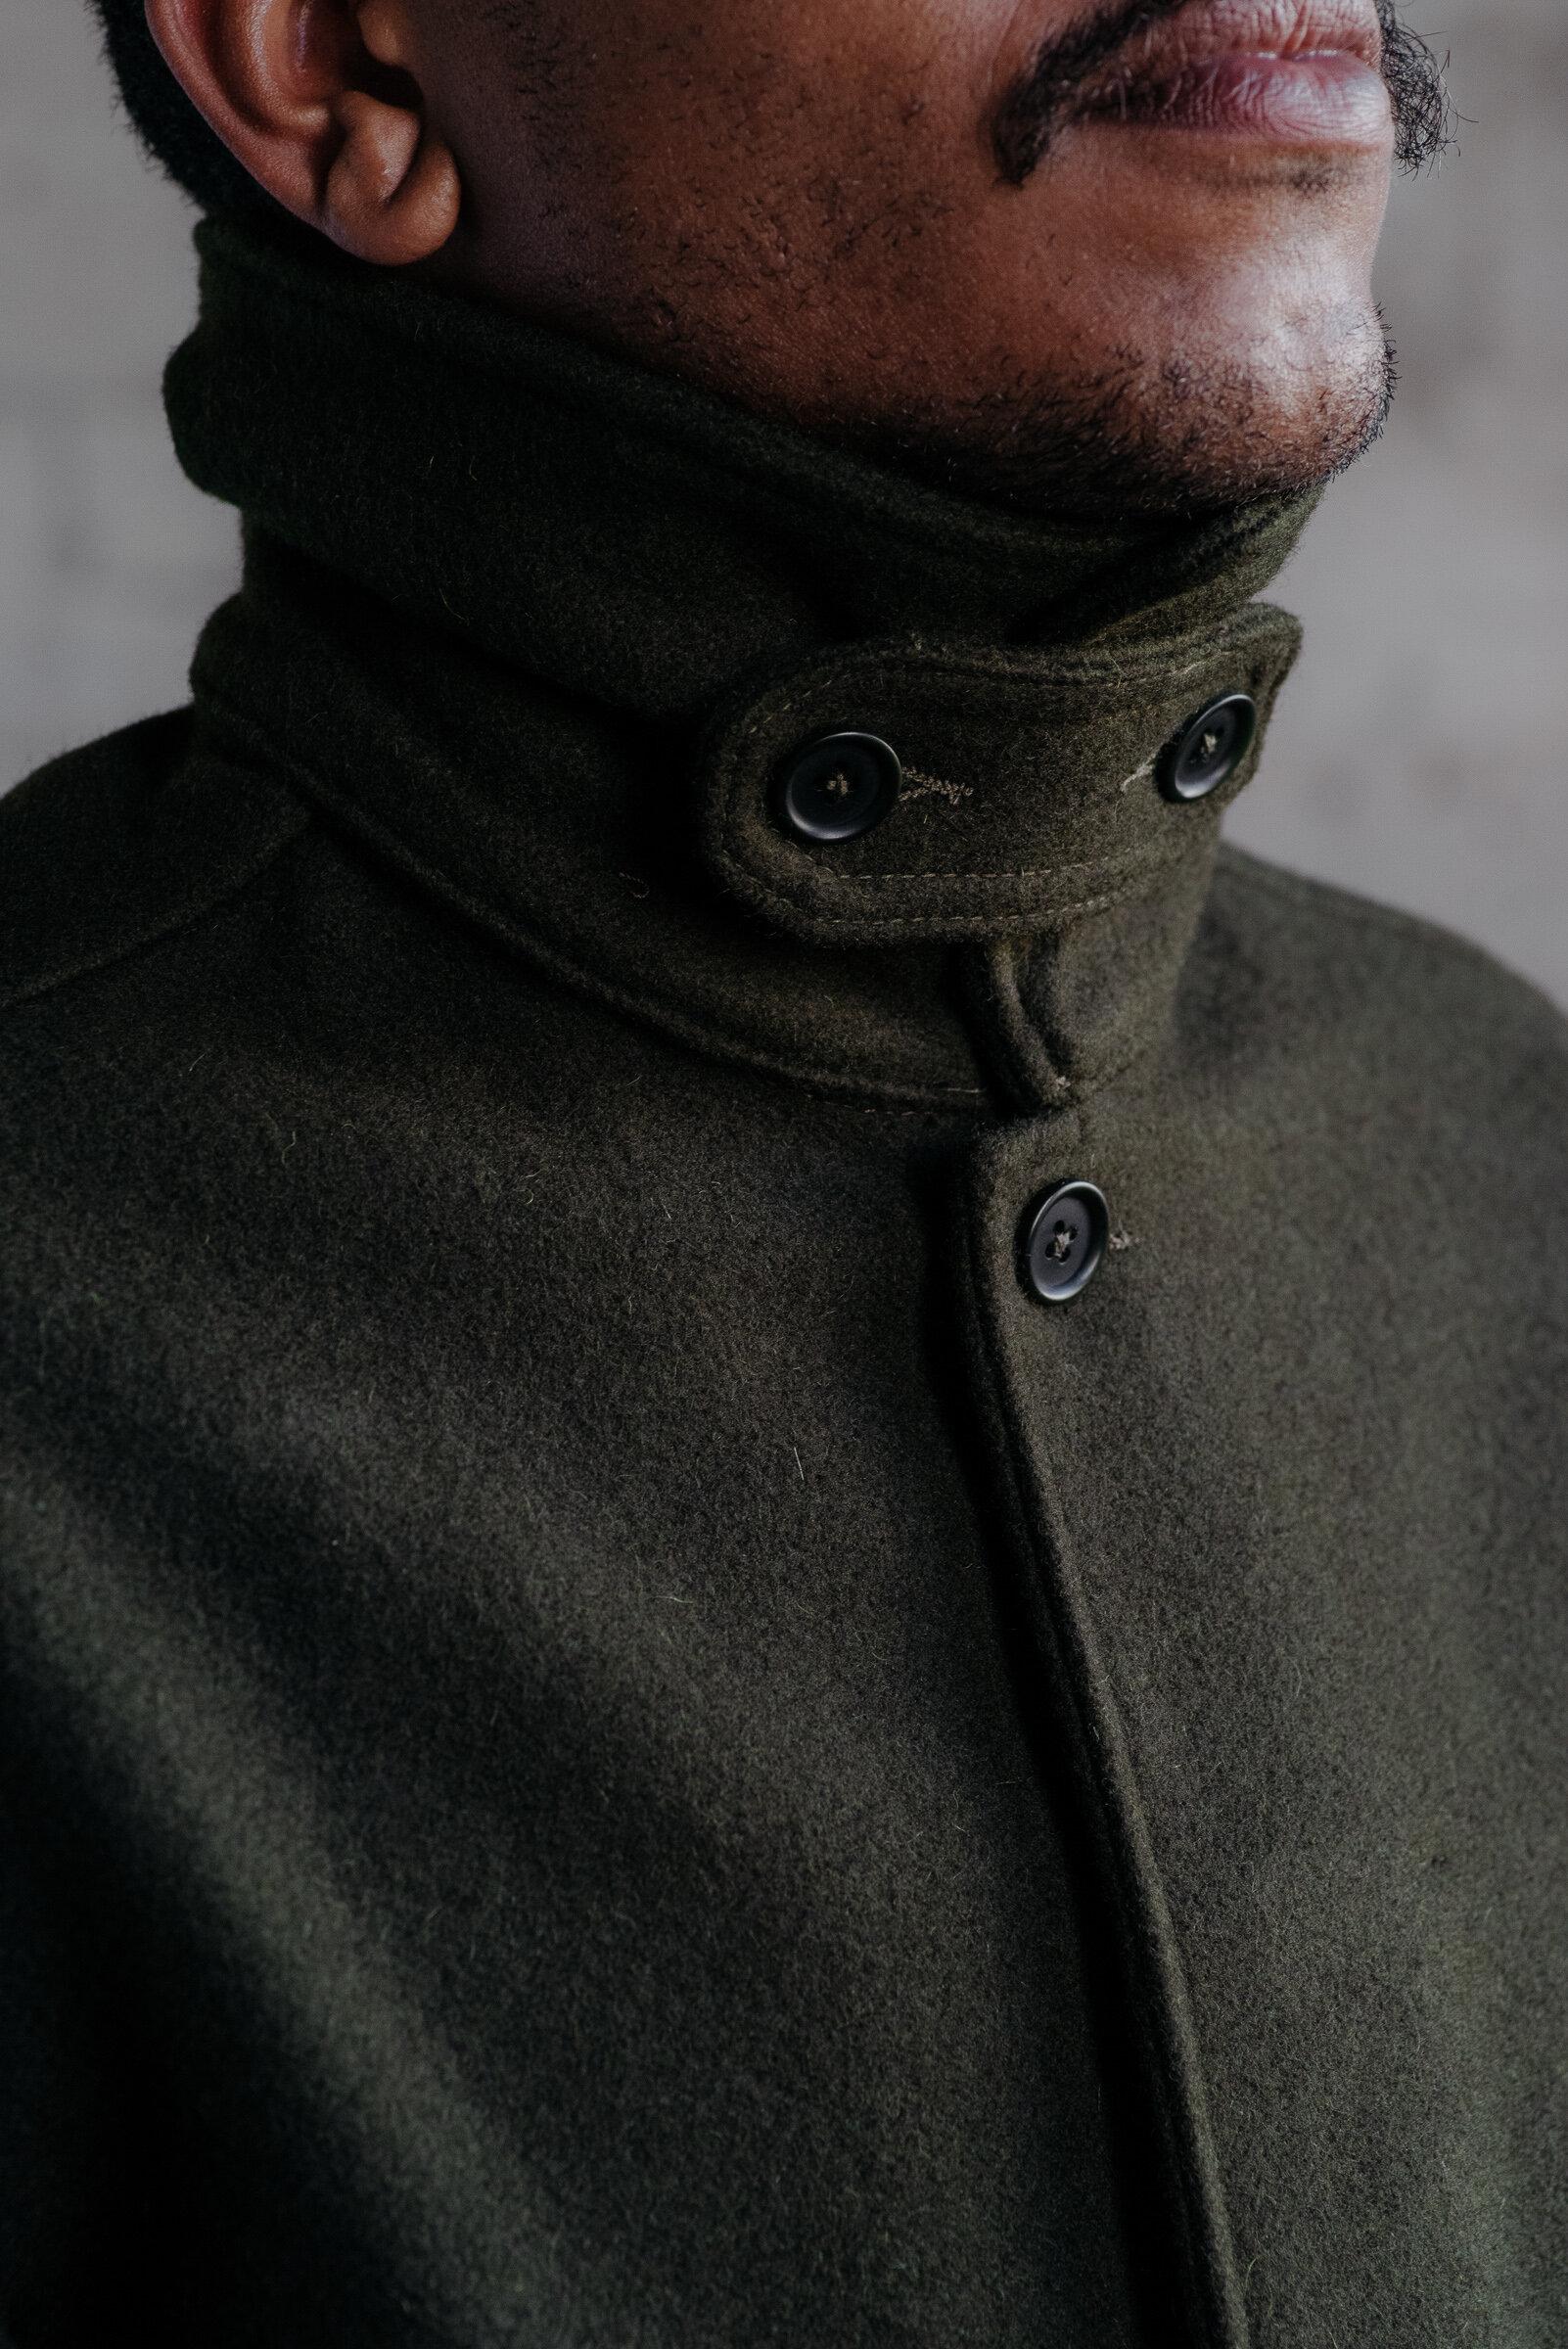 evan-kinori-covered-placket-coat-melton-wool-woven-in-japan-5